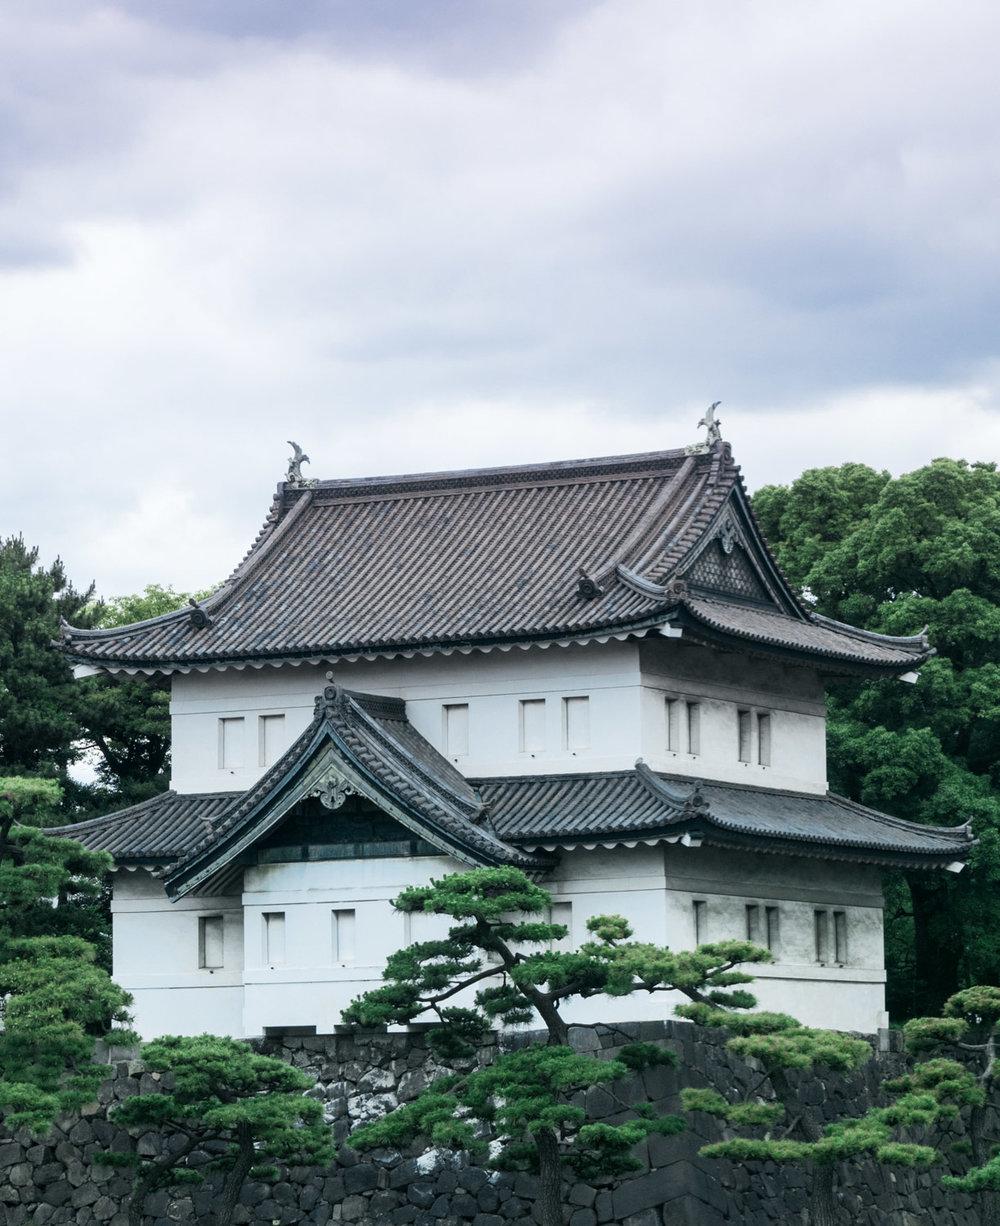 amaris-woo-tokyo-japan-imperial-palace-east-gardens